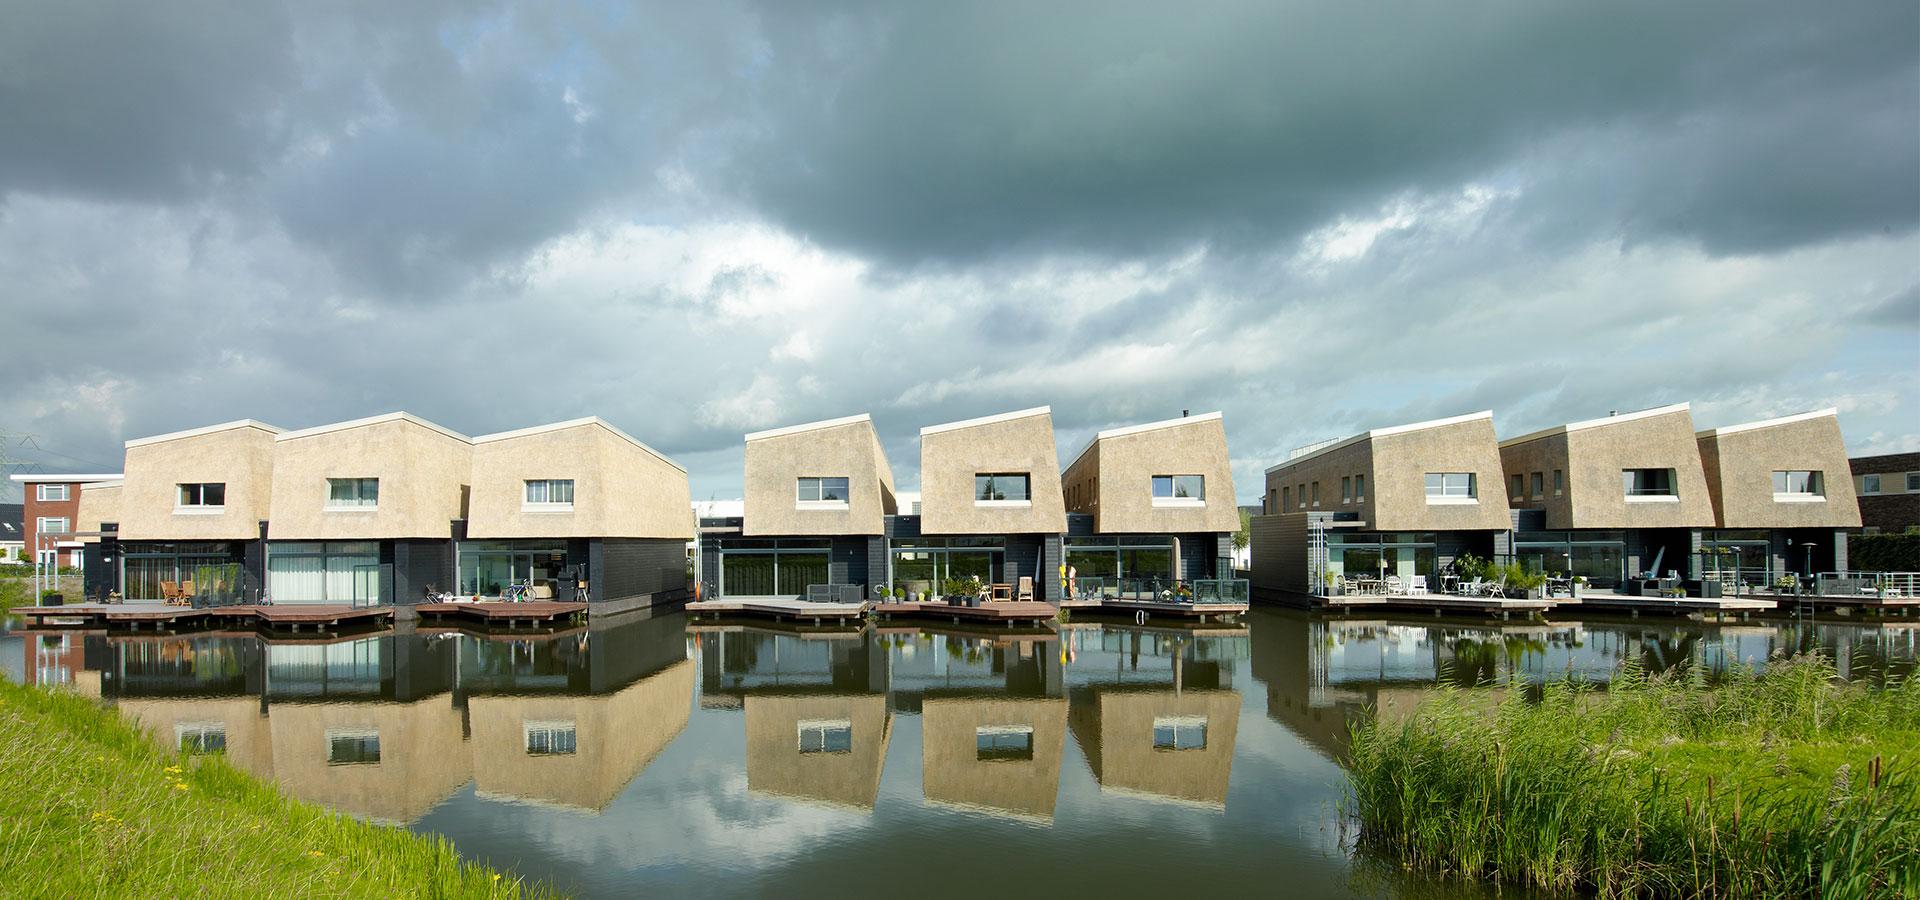 FARO architecten Waterwoningen Nesselande Rotterdam 05